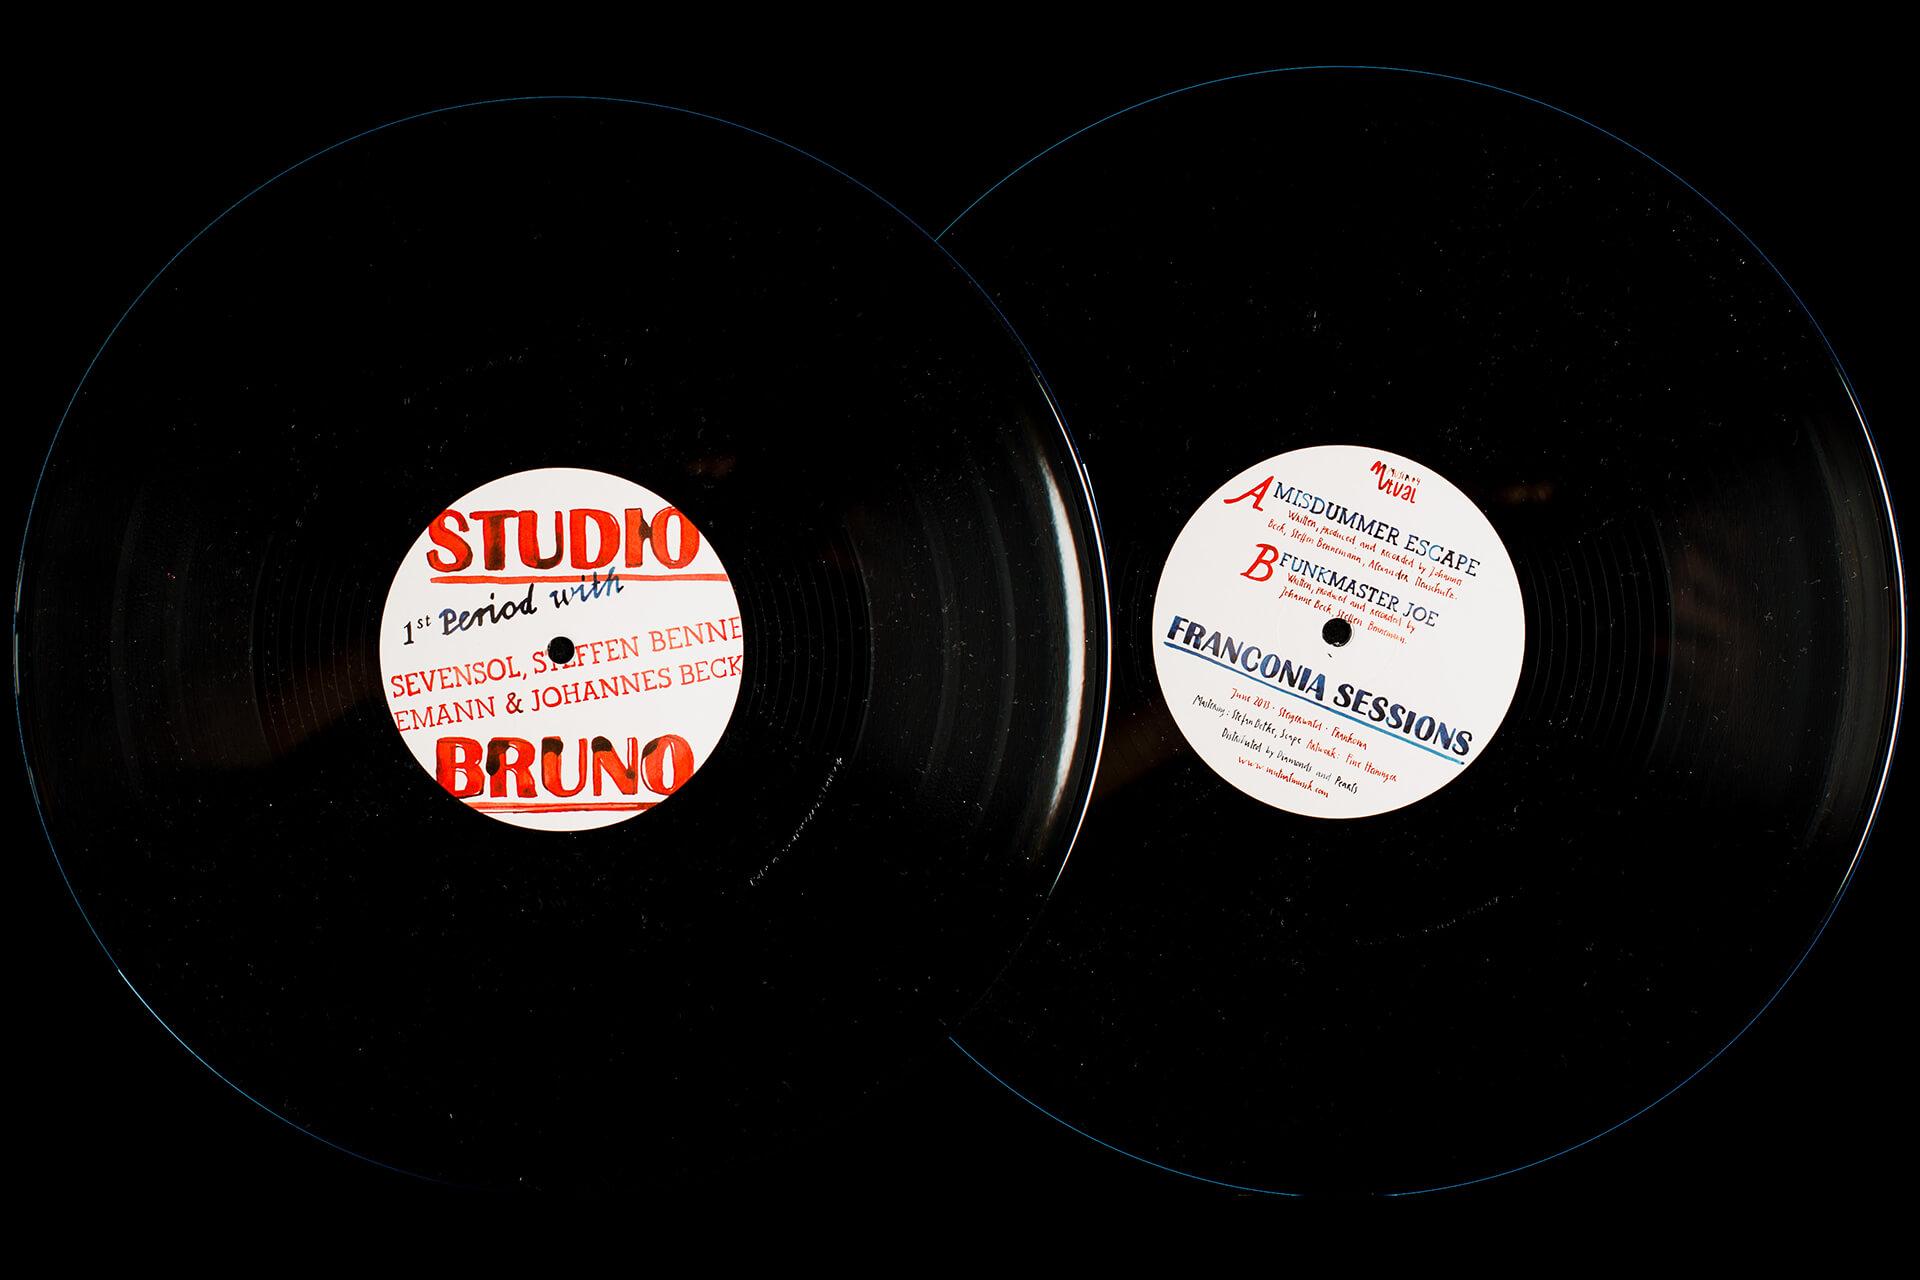 Denken & Handeln, Mutual Musik, Fine Heininger, Plattenlabel, Platten-Cover Gestaltung, EP Cover, Illustration, Berlin, Musik Label, CI, Corporate Identity, Visuelle Identität